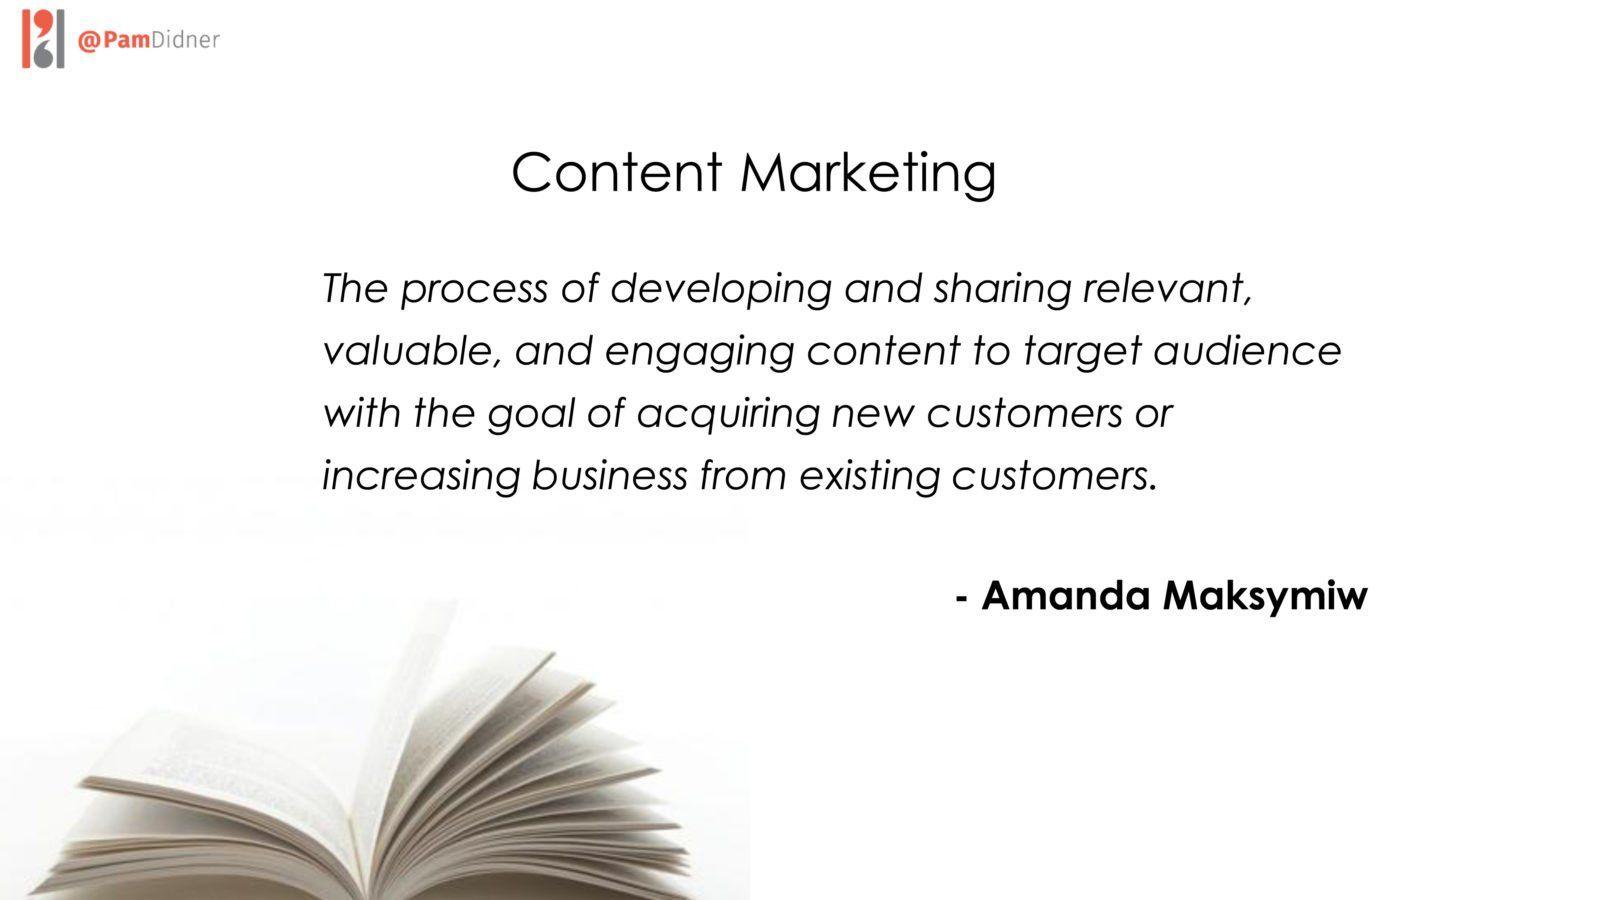 Amanda Maksymiw Content Marketing Definition